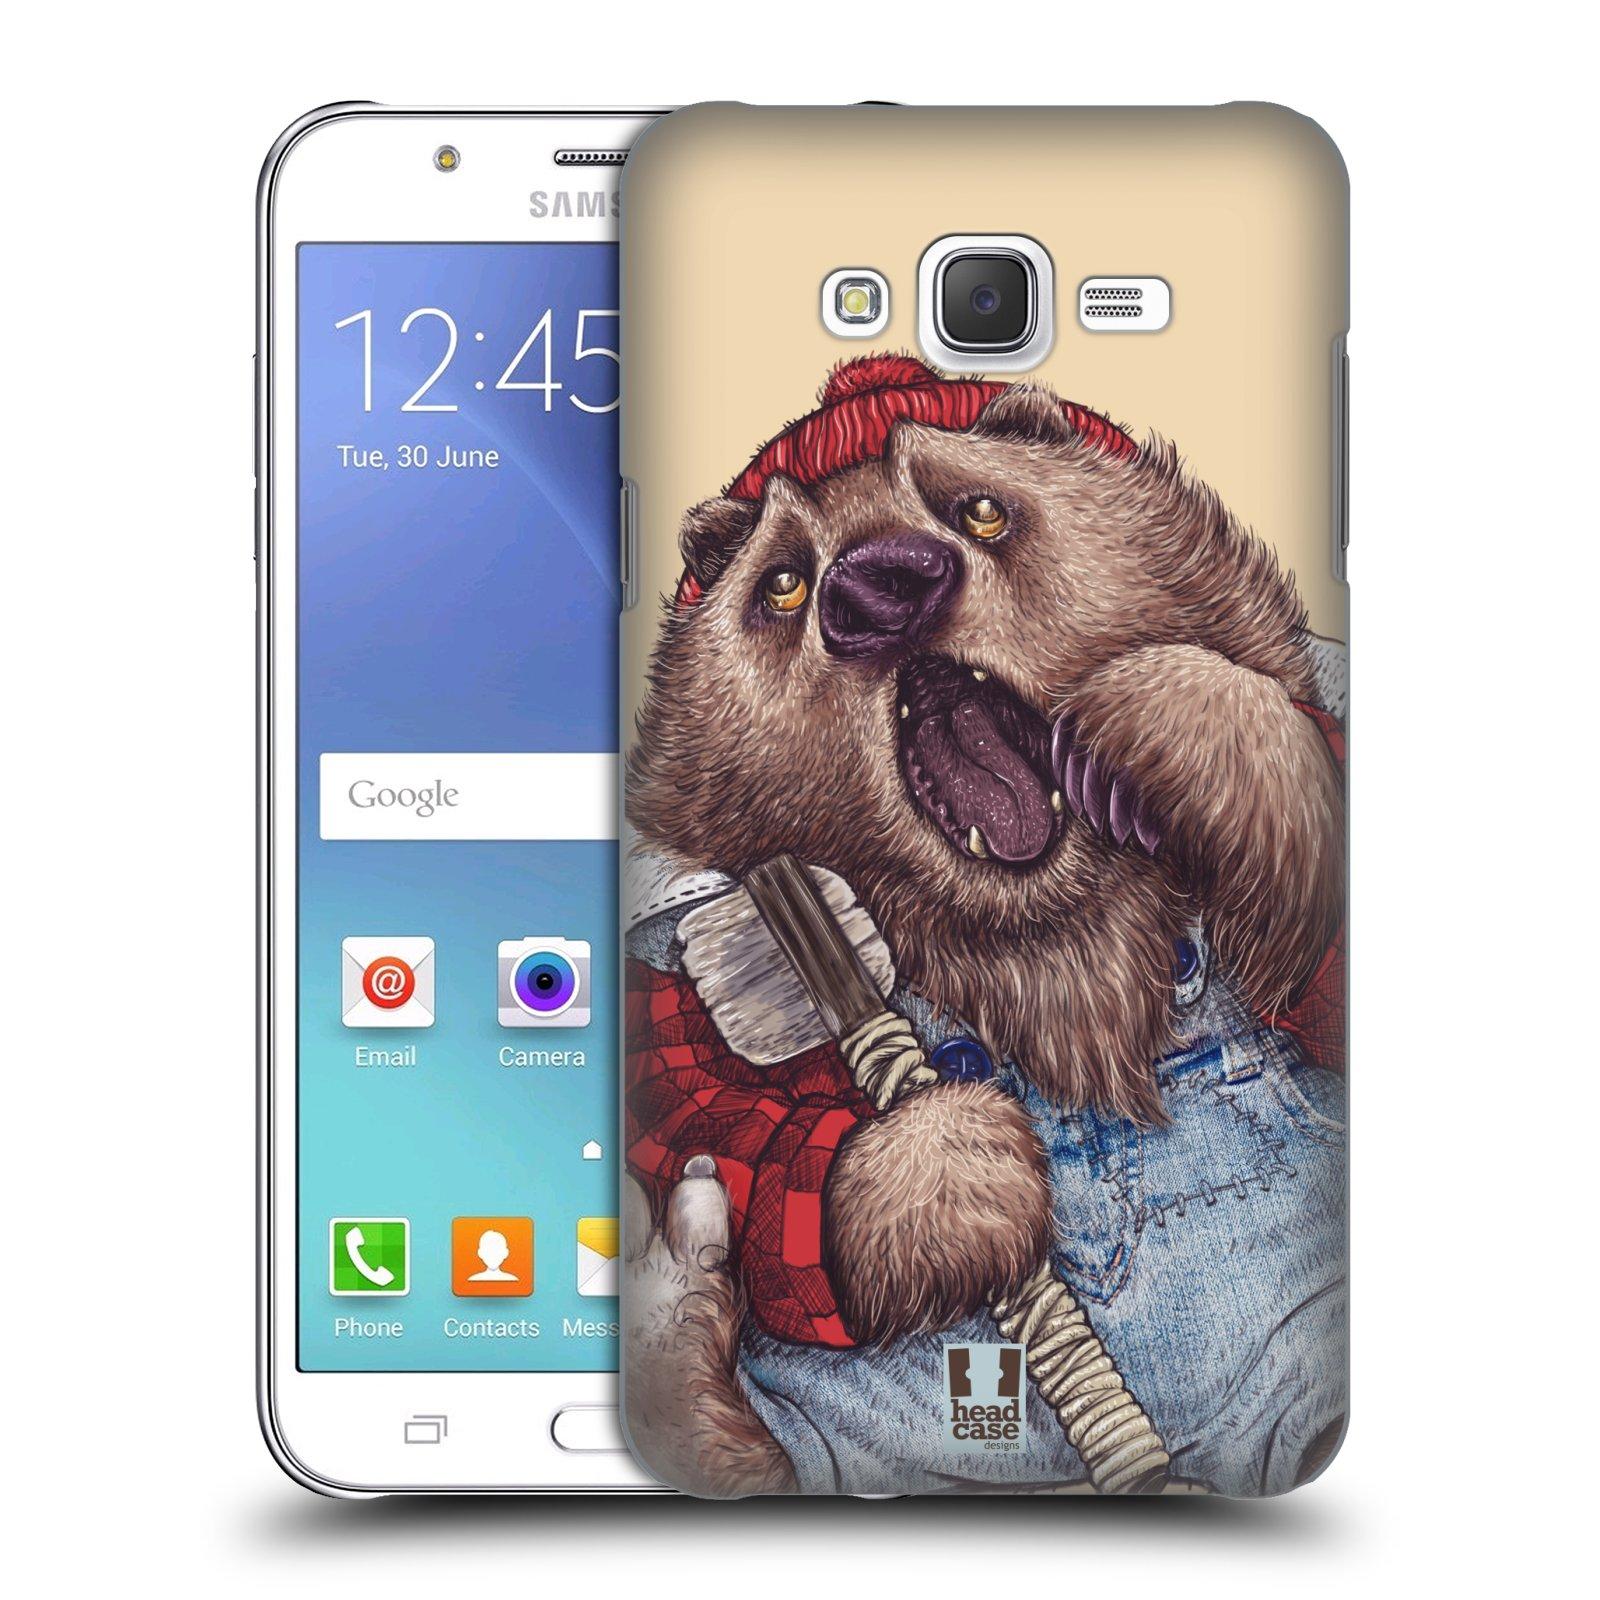 HEAD CASE plastový obal na mobil SAMSUNG Galaxy J7, J700 vzor Kreslená zvířátka medvěd